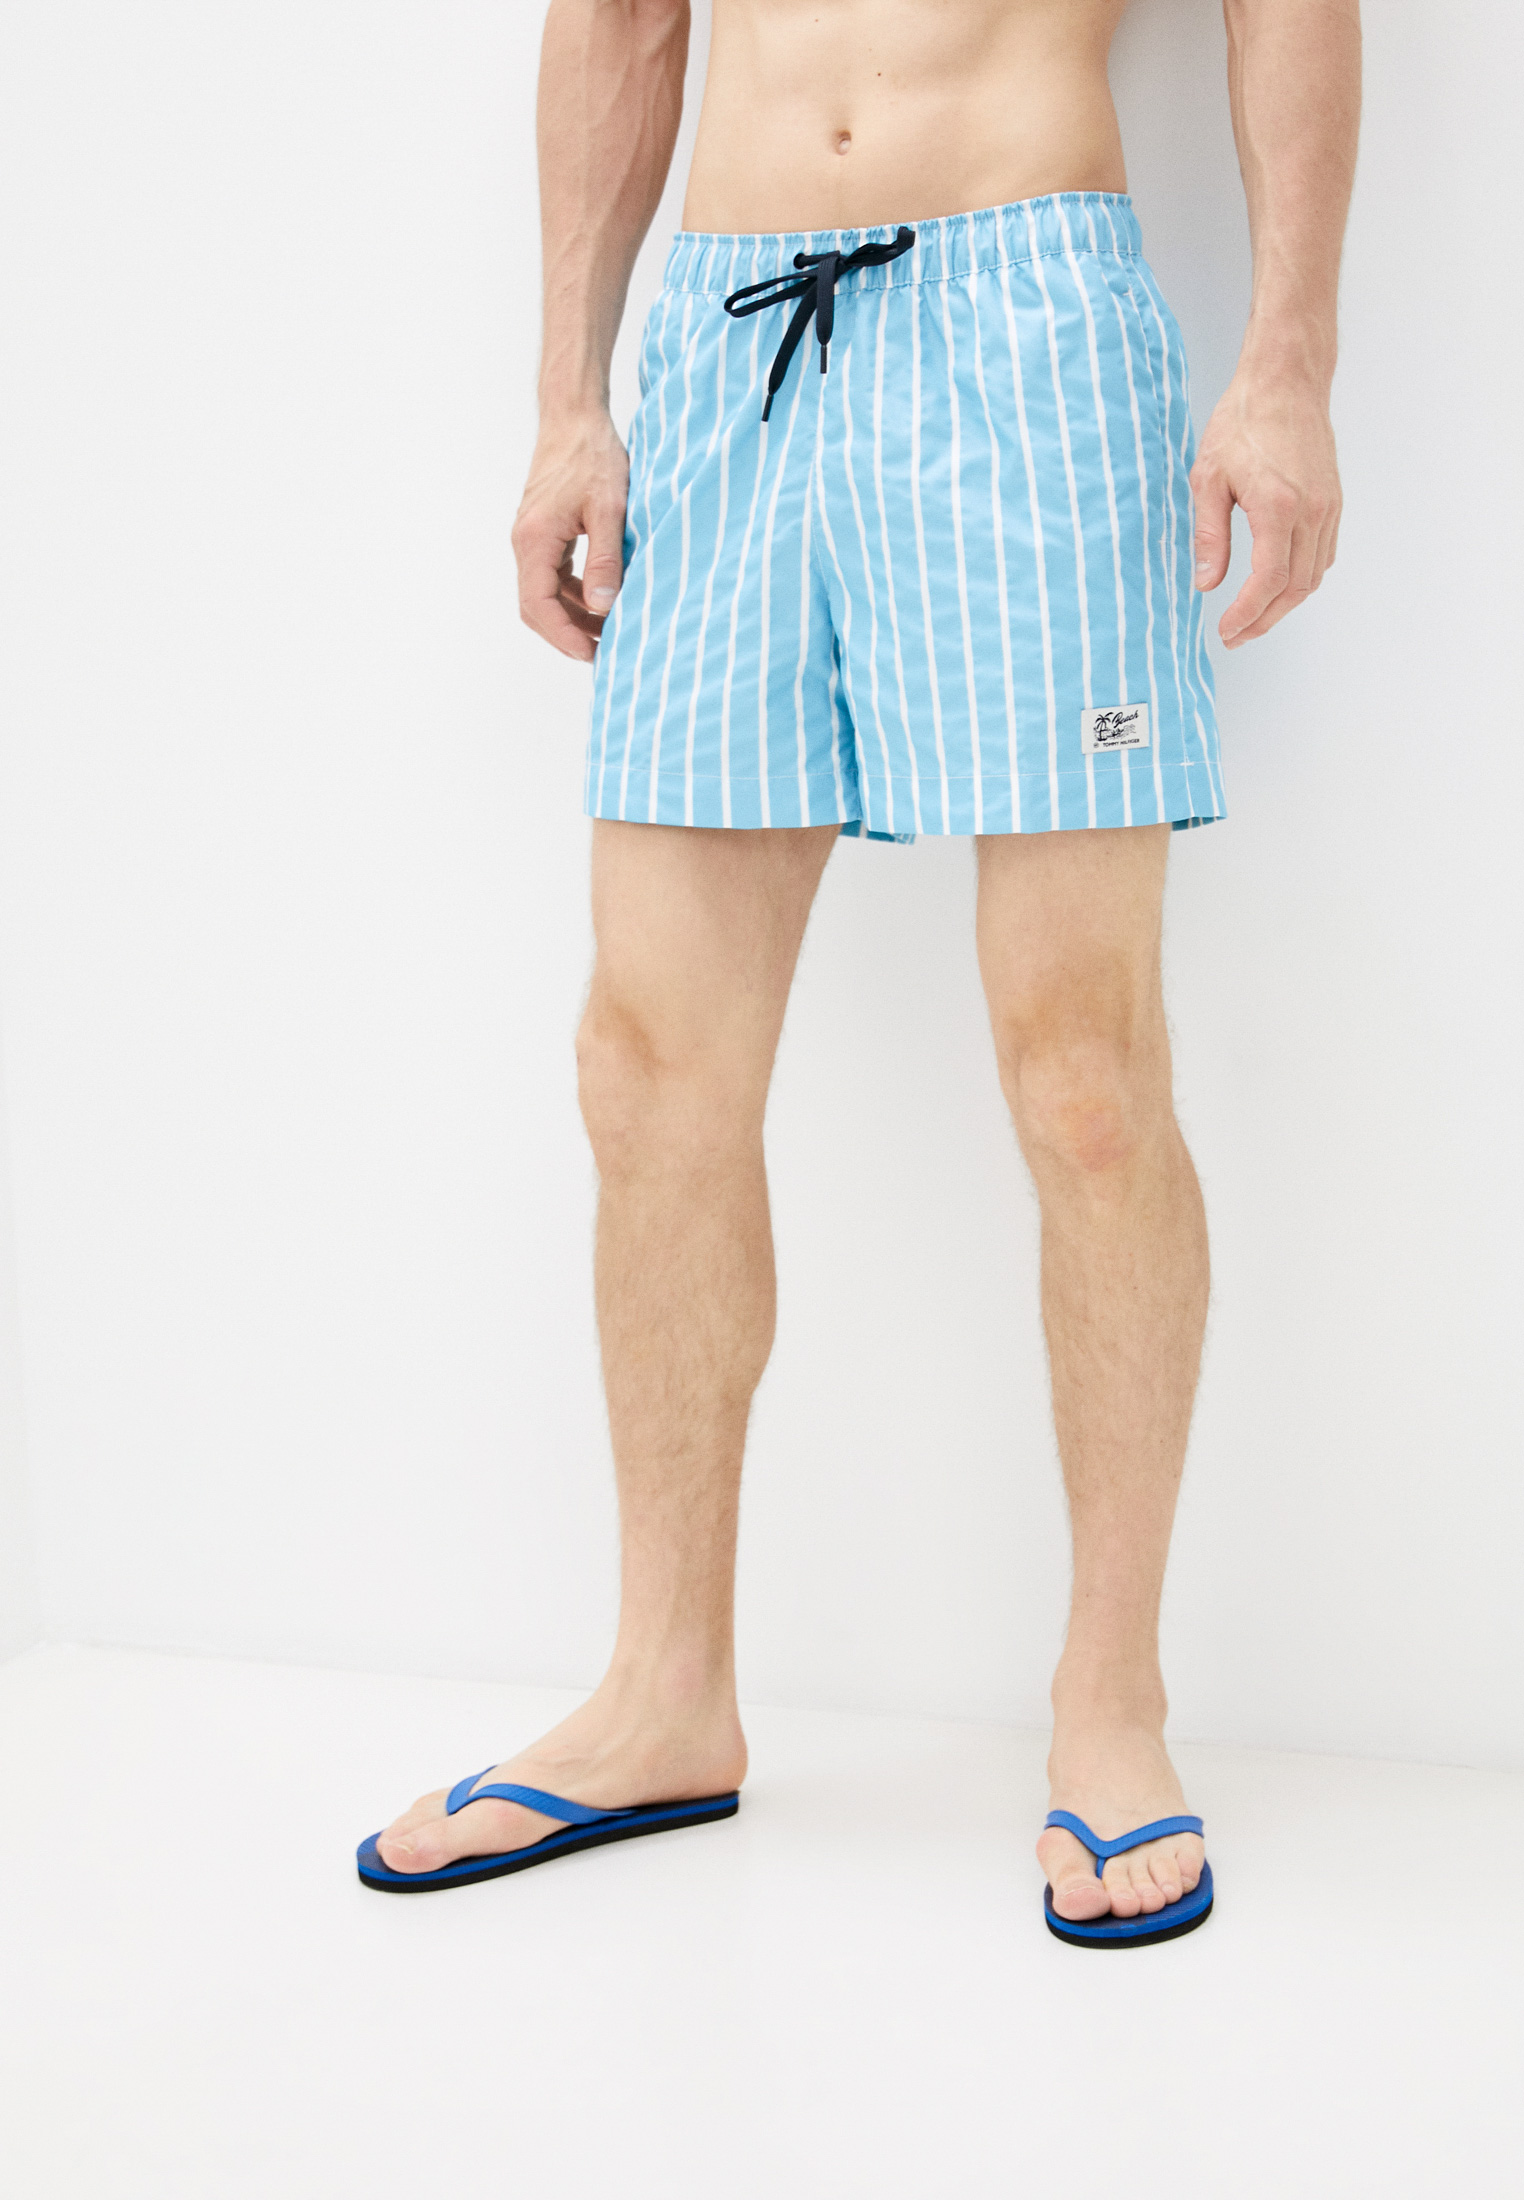 Мужские шорты для плавания Tommy Hilfiger (Томми Хилфигер) Шорты для плавания Tommy Hilfiger